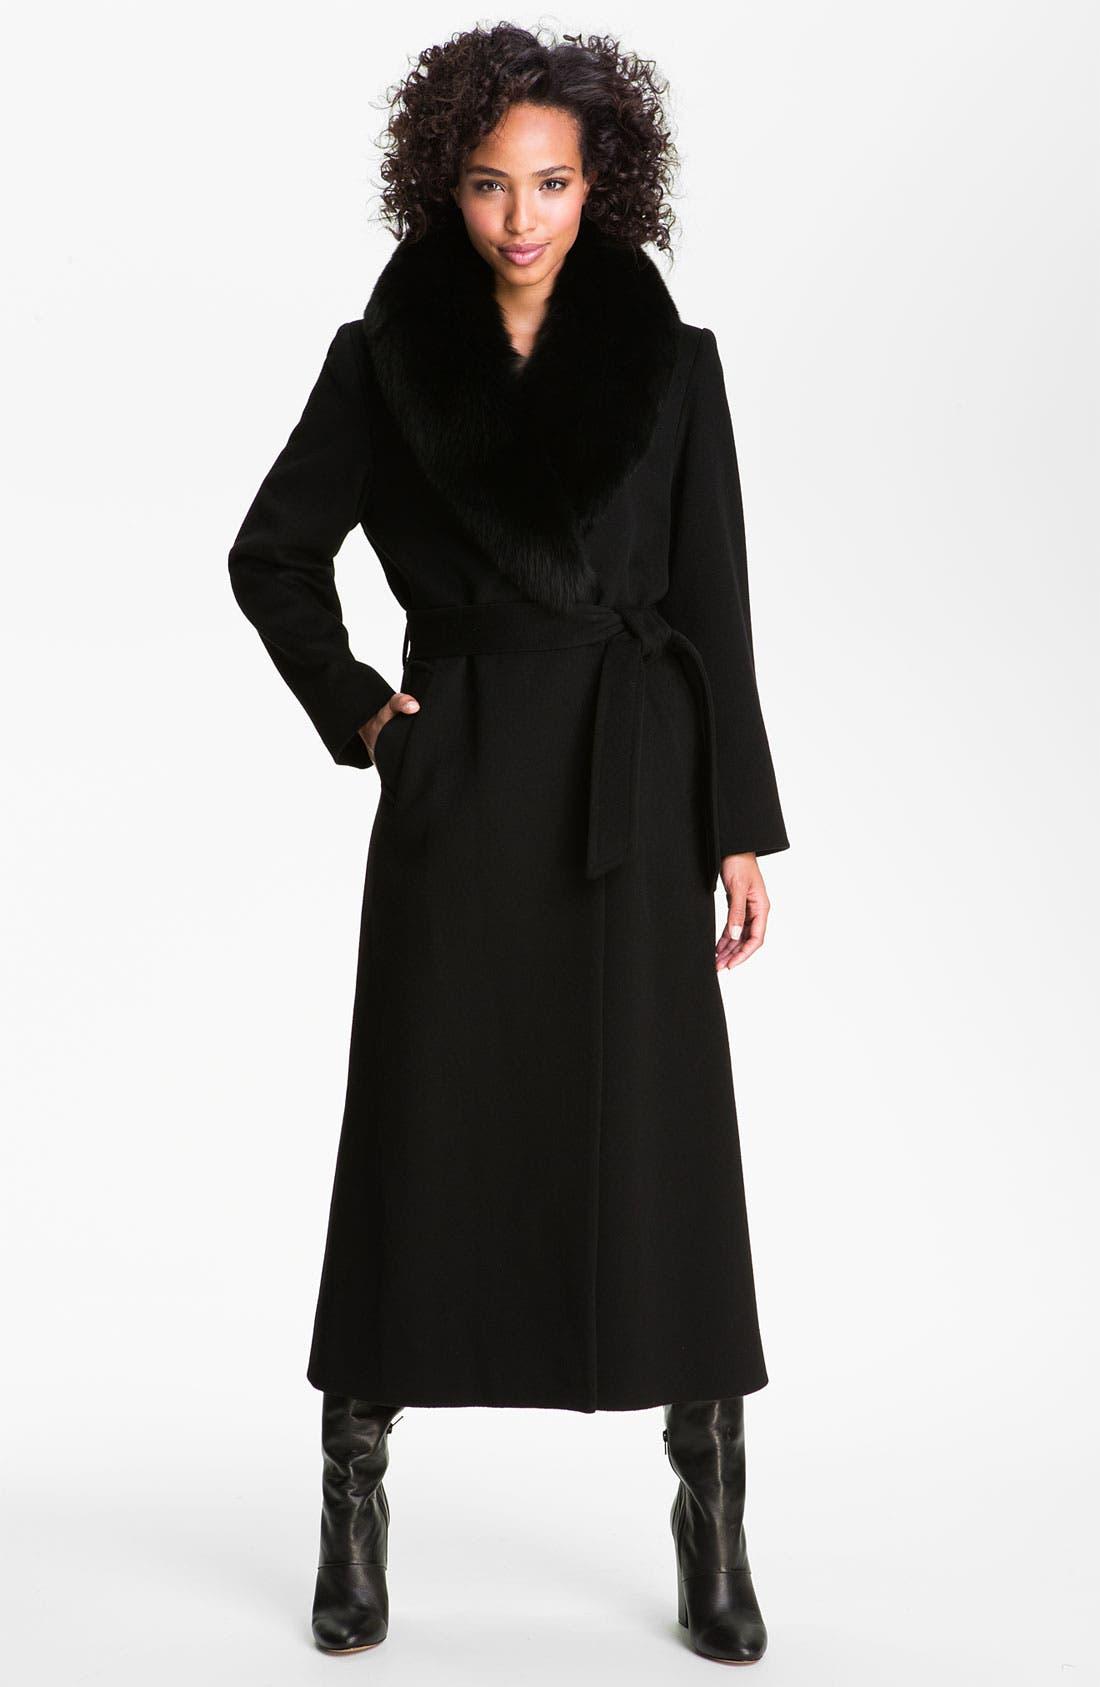 Alternate Image 1 Selected - Dale Dressin Long Wrap Coat with Fox Fur Collar